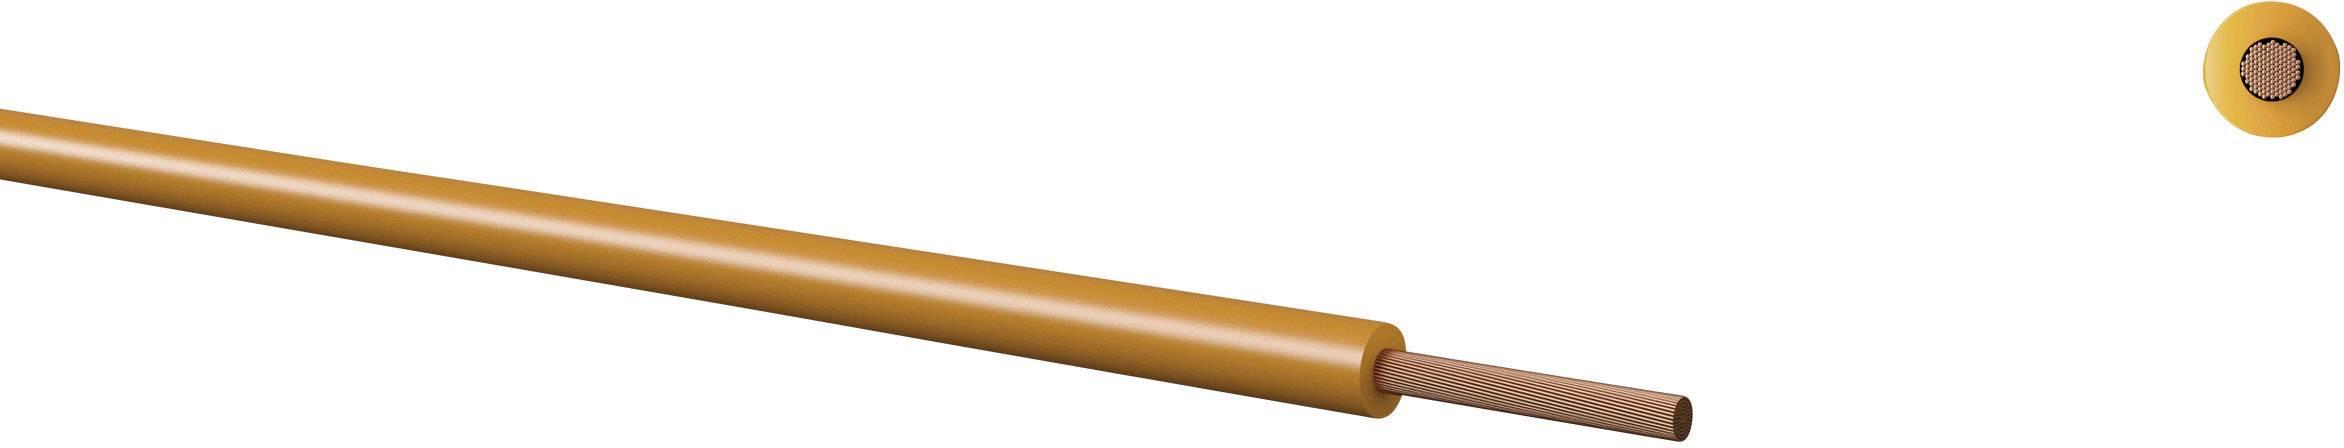 Pletenica LiFY 1 x 0.75 mm, zelena Kabeltronik 160107503 cena za meter